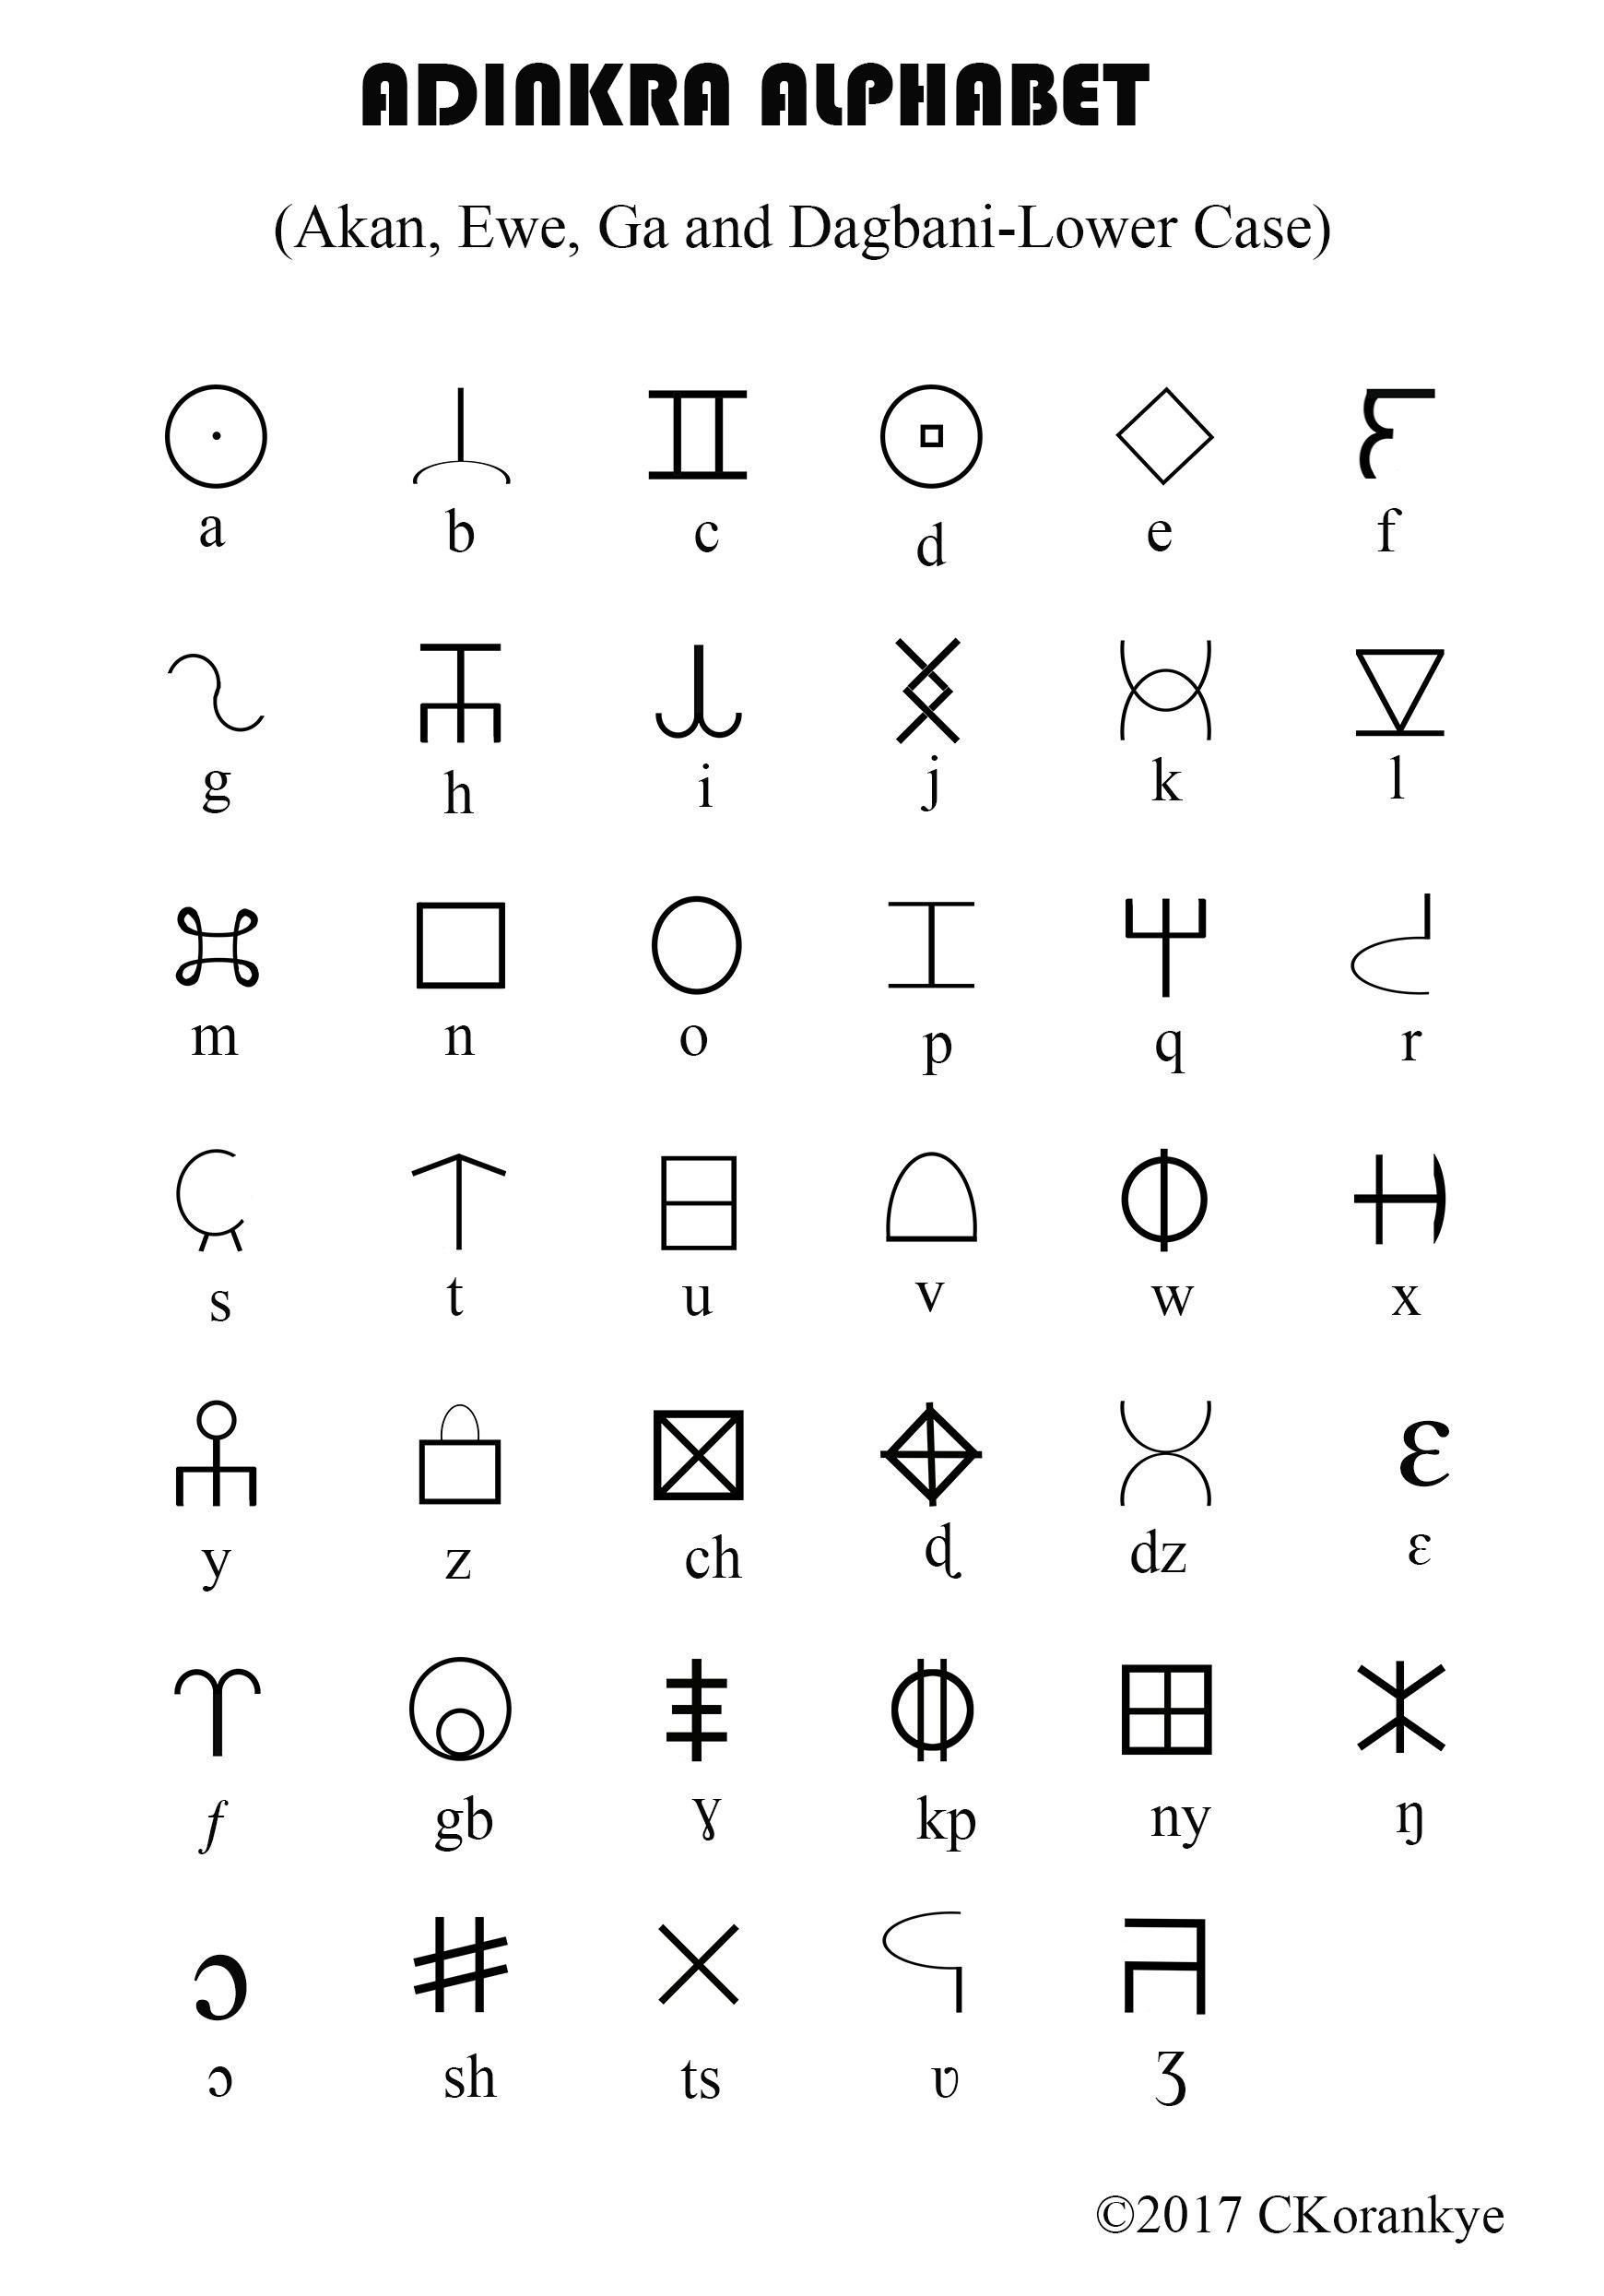 Pin By Adinkra Alphabet On Adinkra Alphabet